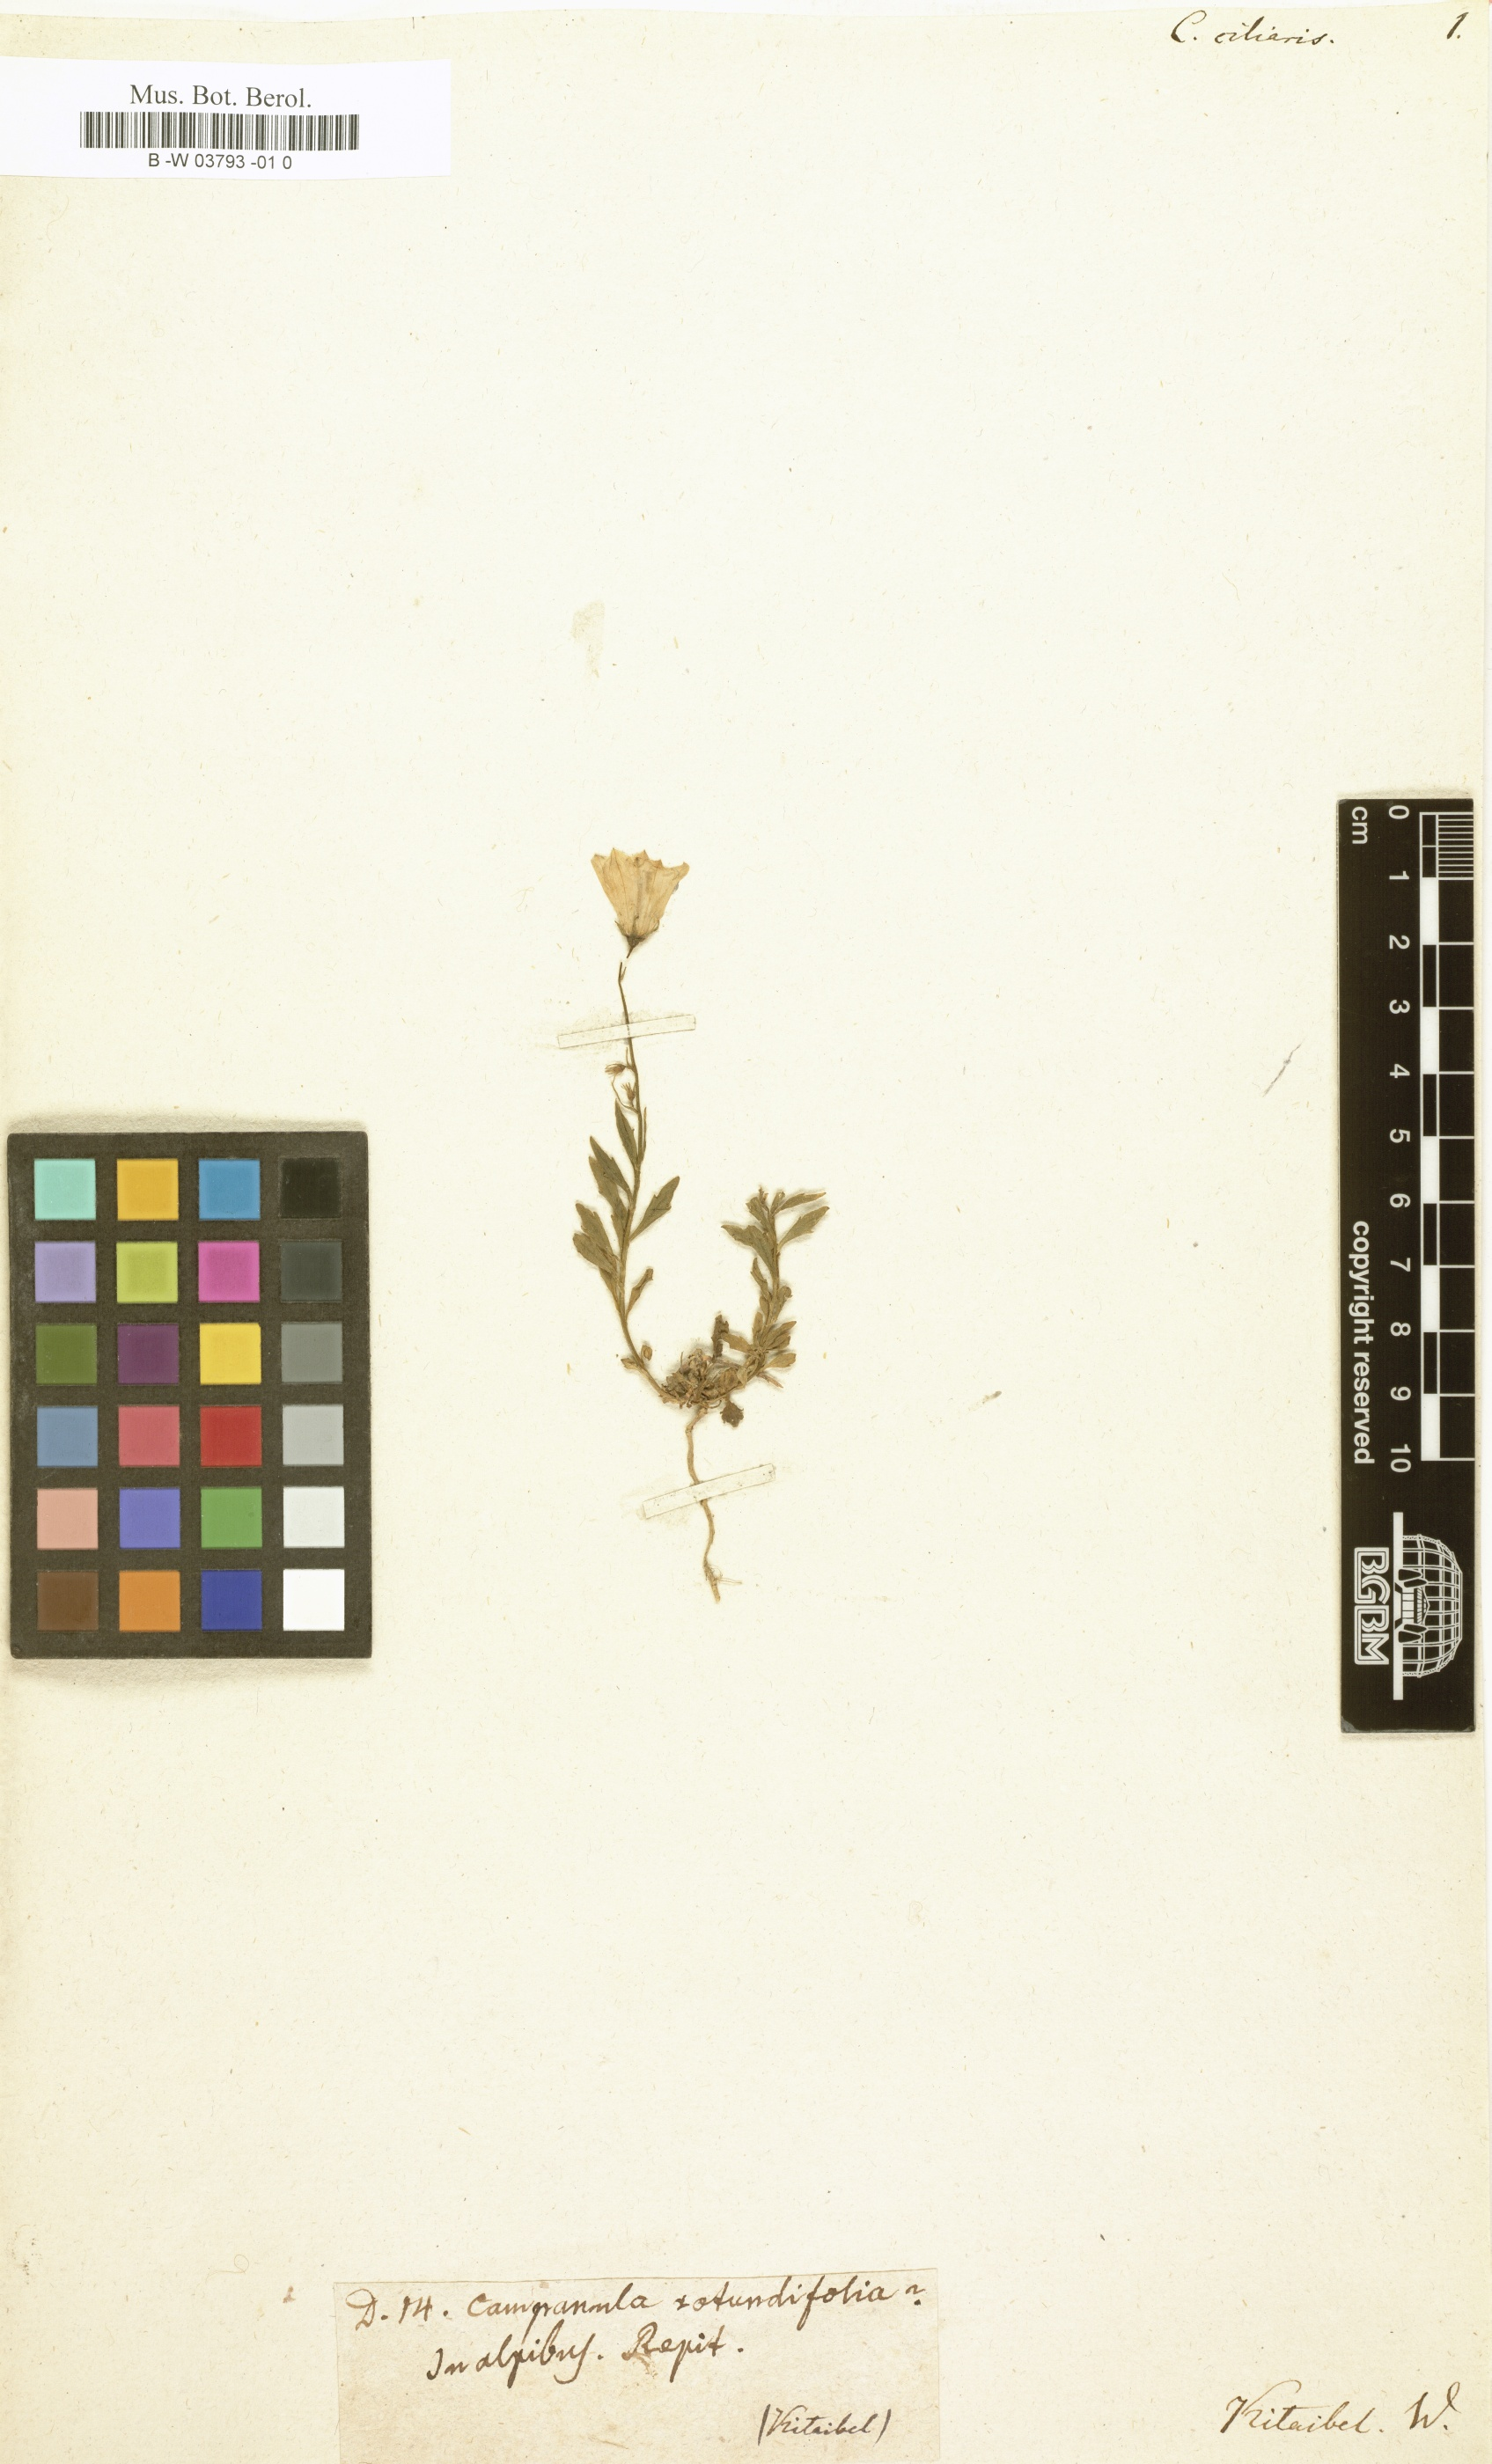 http://ww2.bgbm.org/herbarium/images/B/-W/03/79/B_-W_03793%20-01%200.jpg